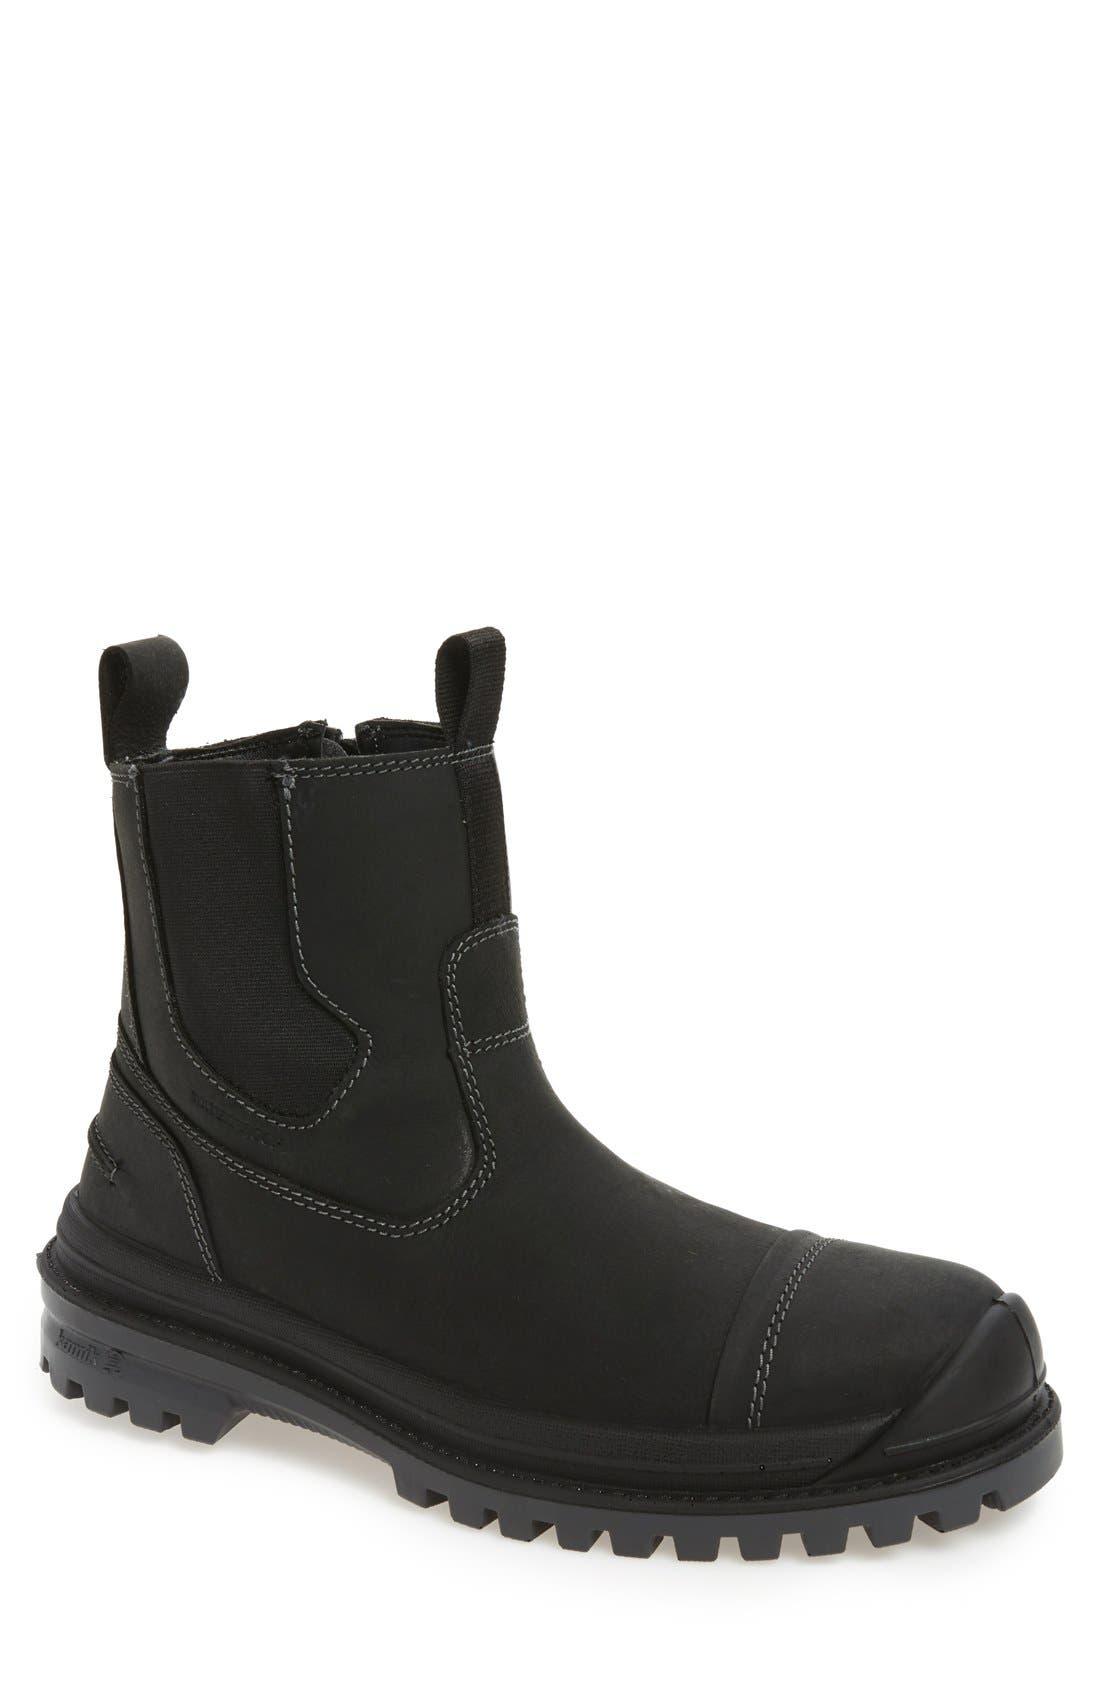 Griffon Snow Boot,                         Main,                         color, Black Leather